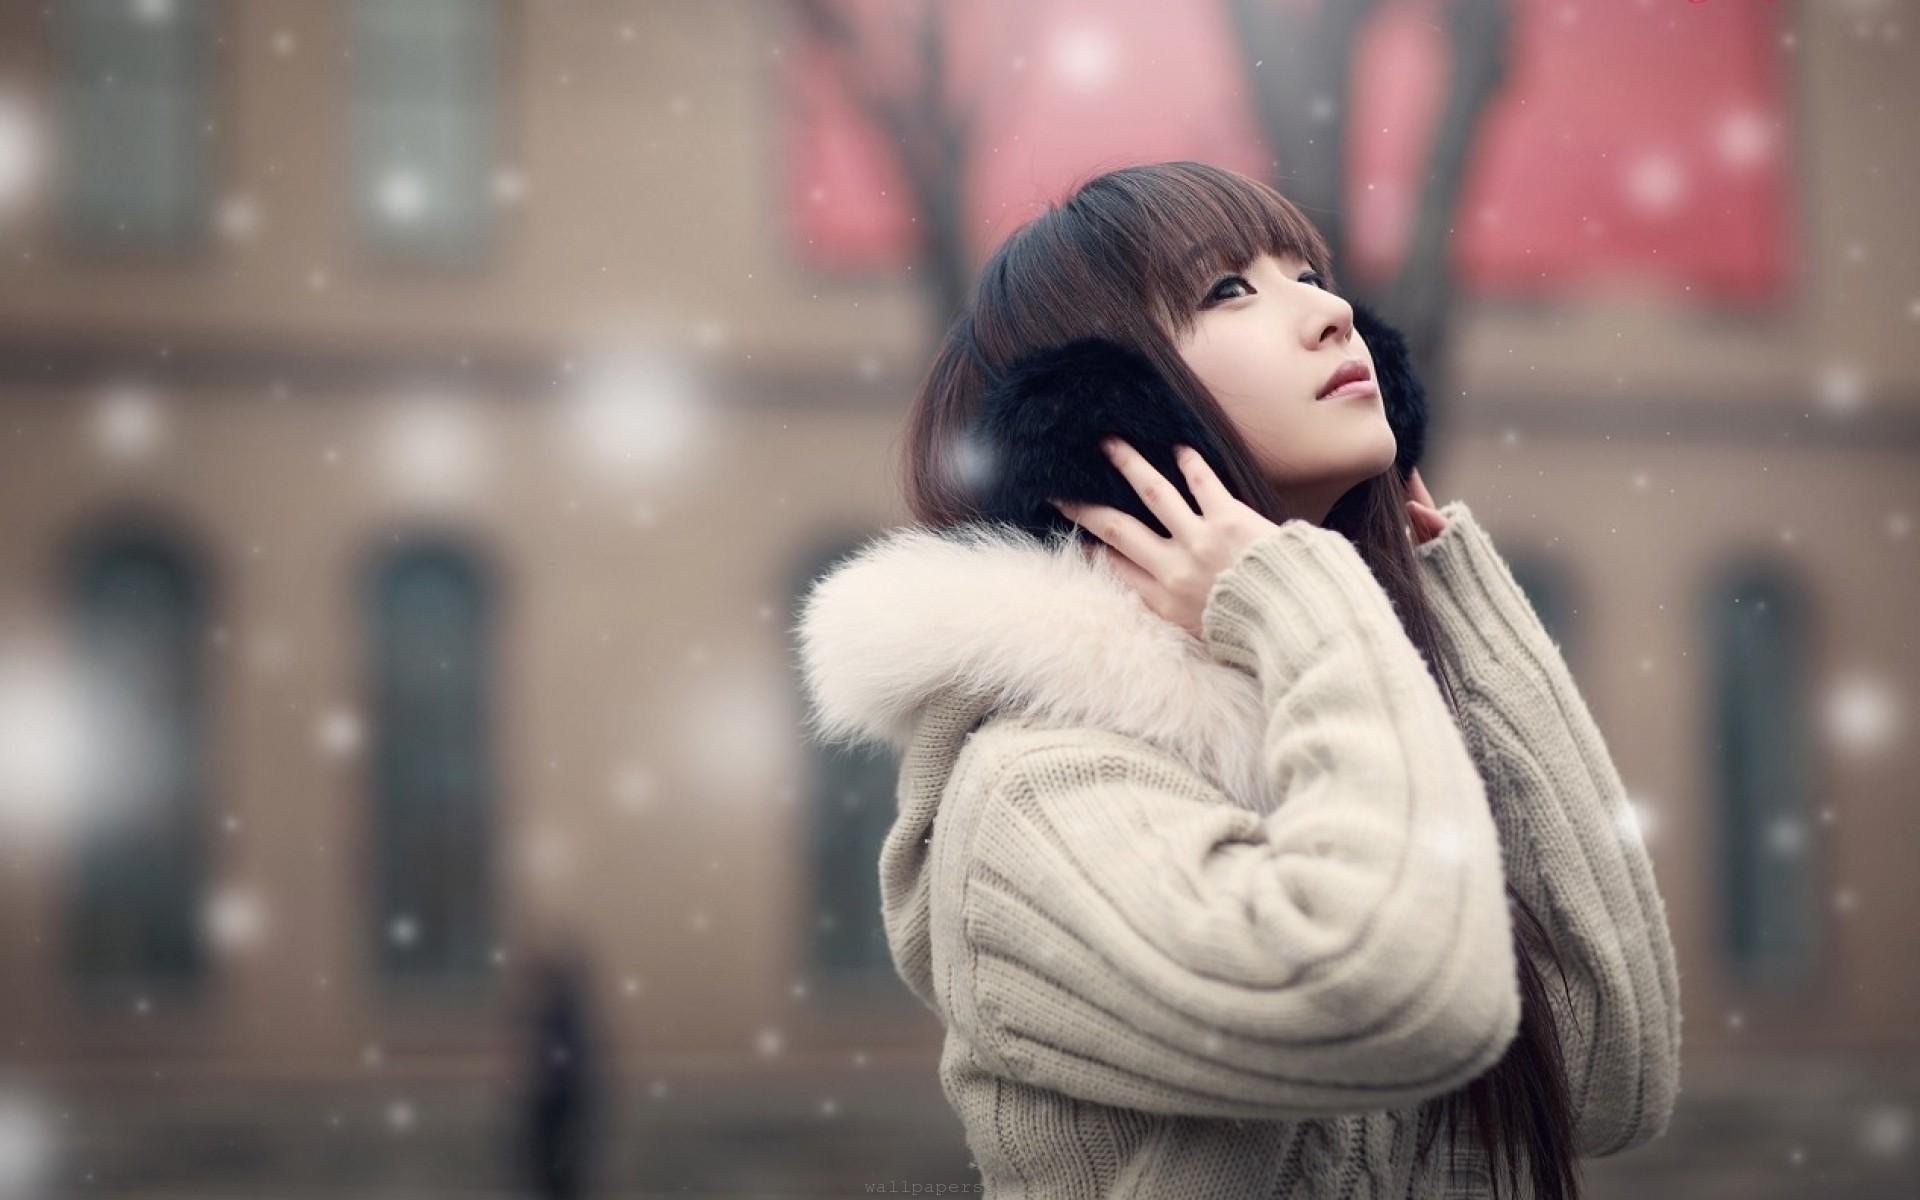 Beautiful Asian Girl in Snow Fall HD Wallpaper